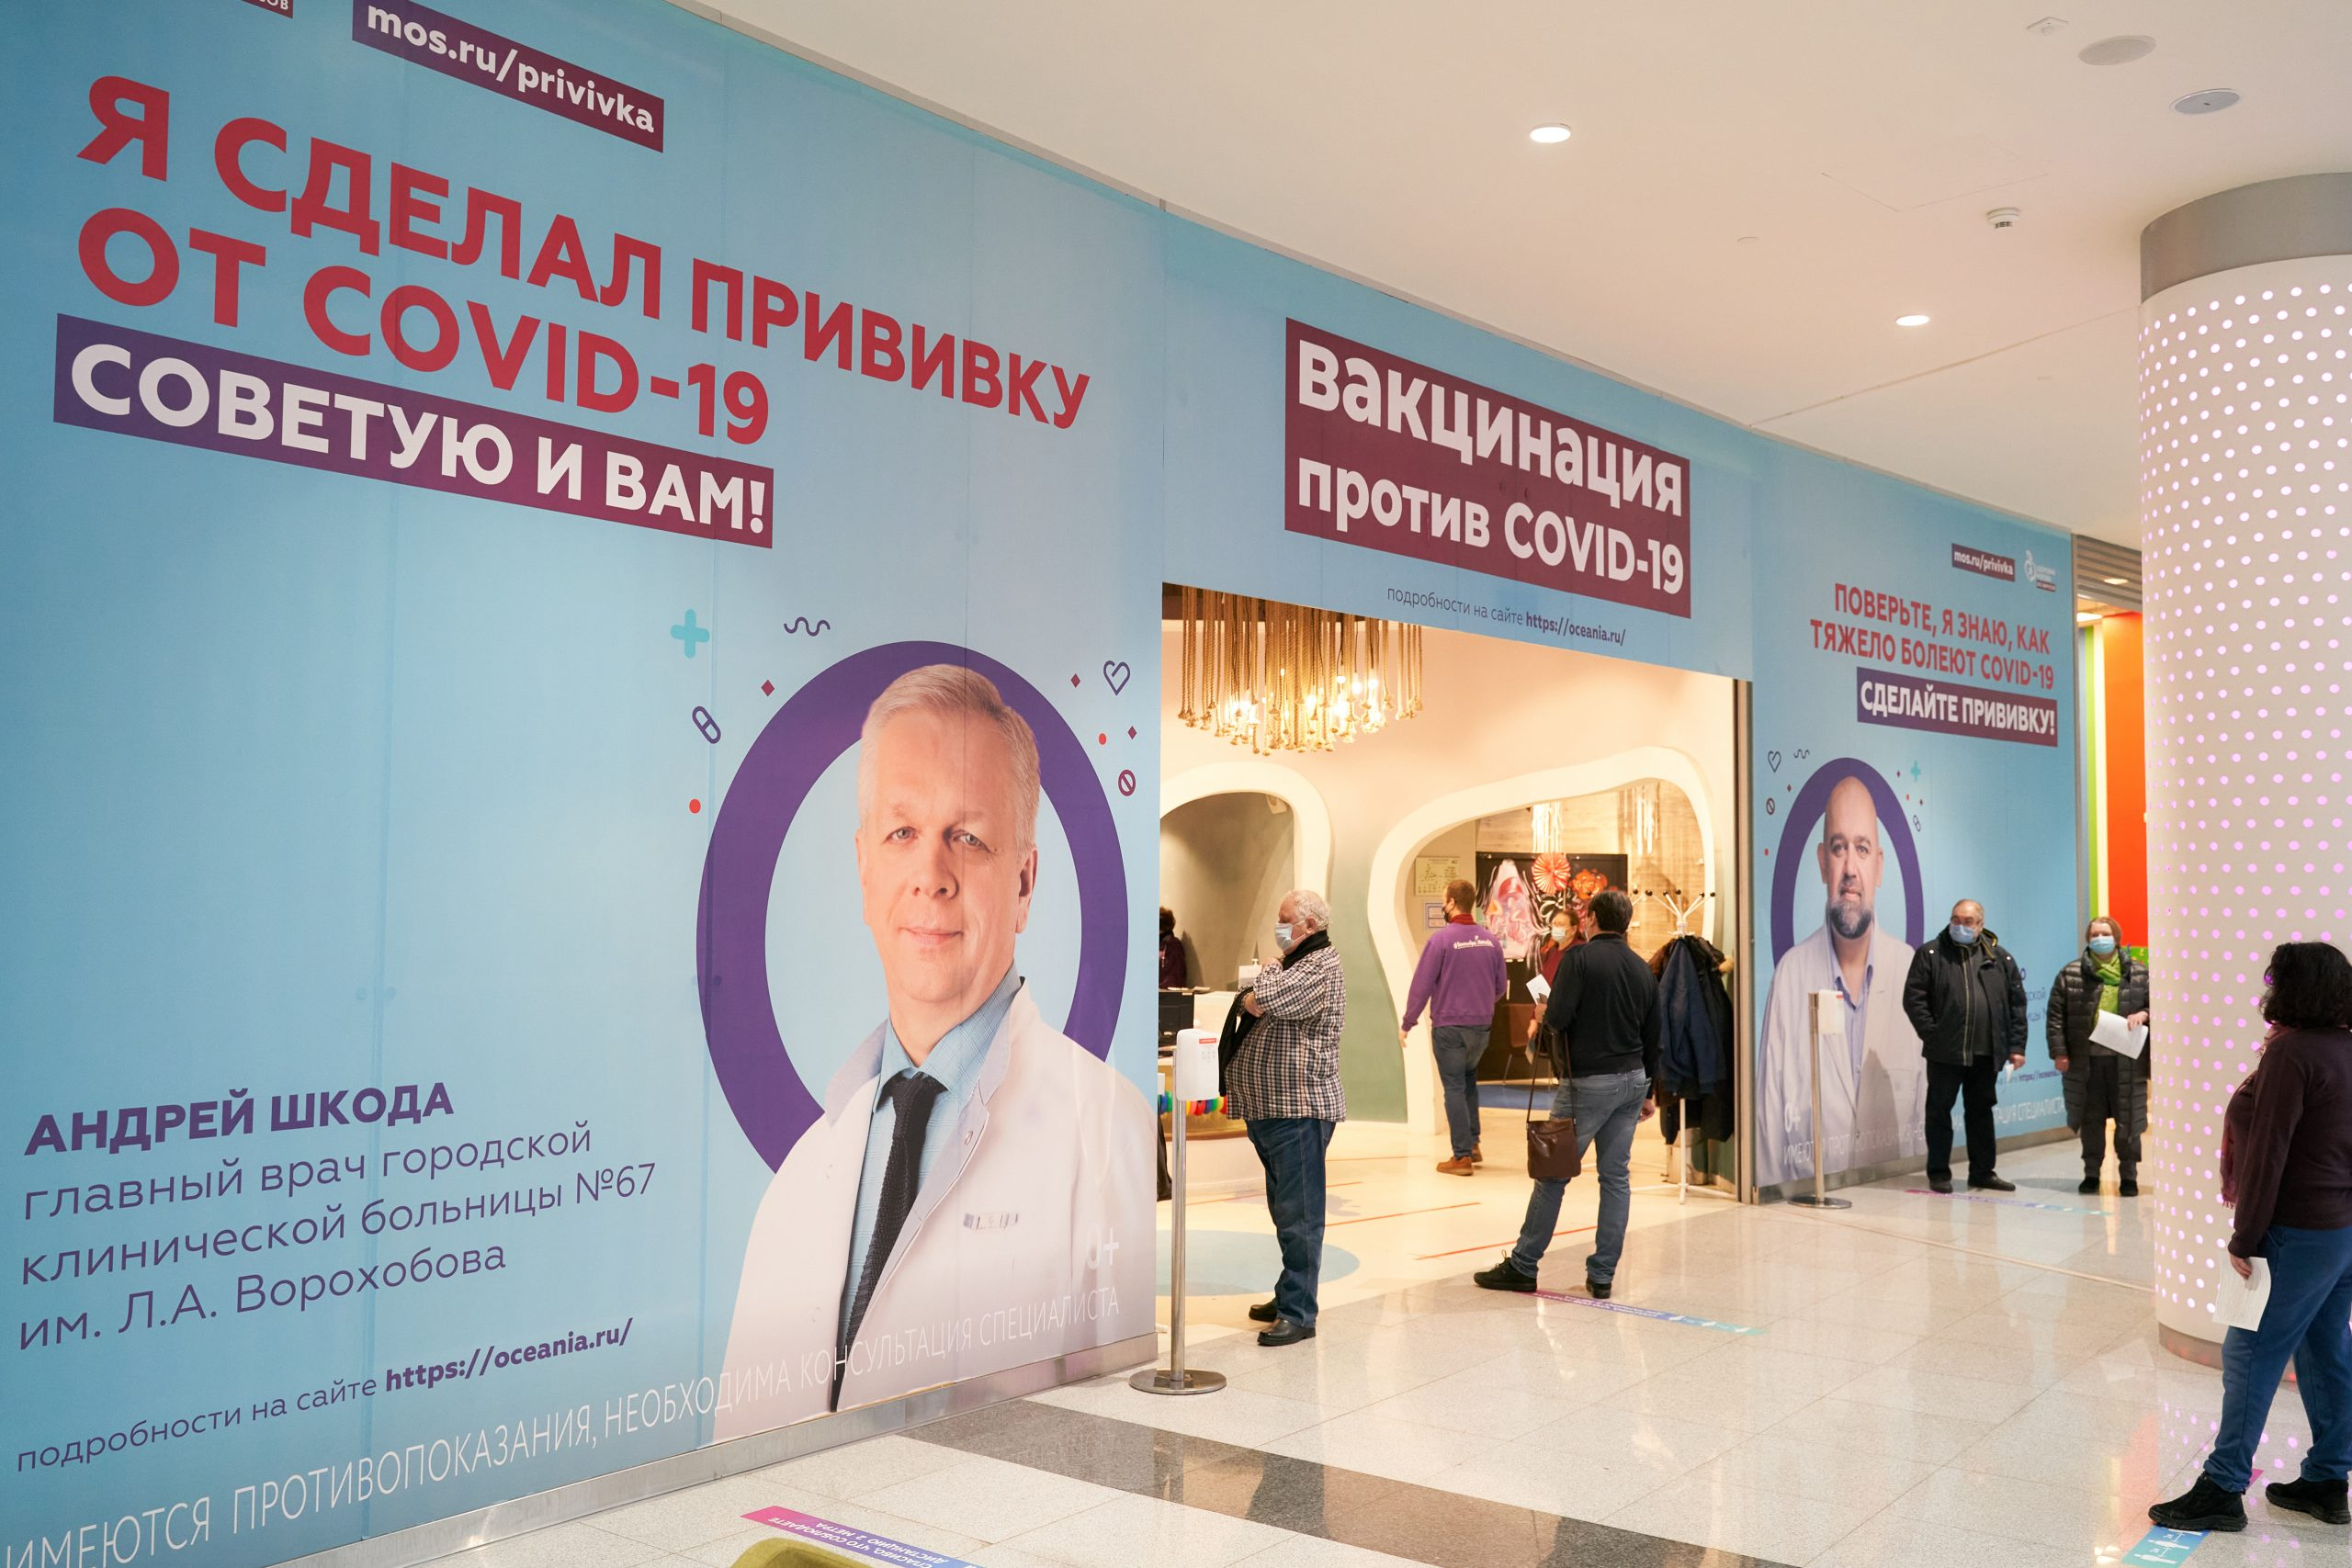 Moskva, vakcinacija